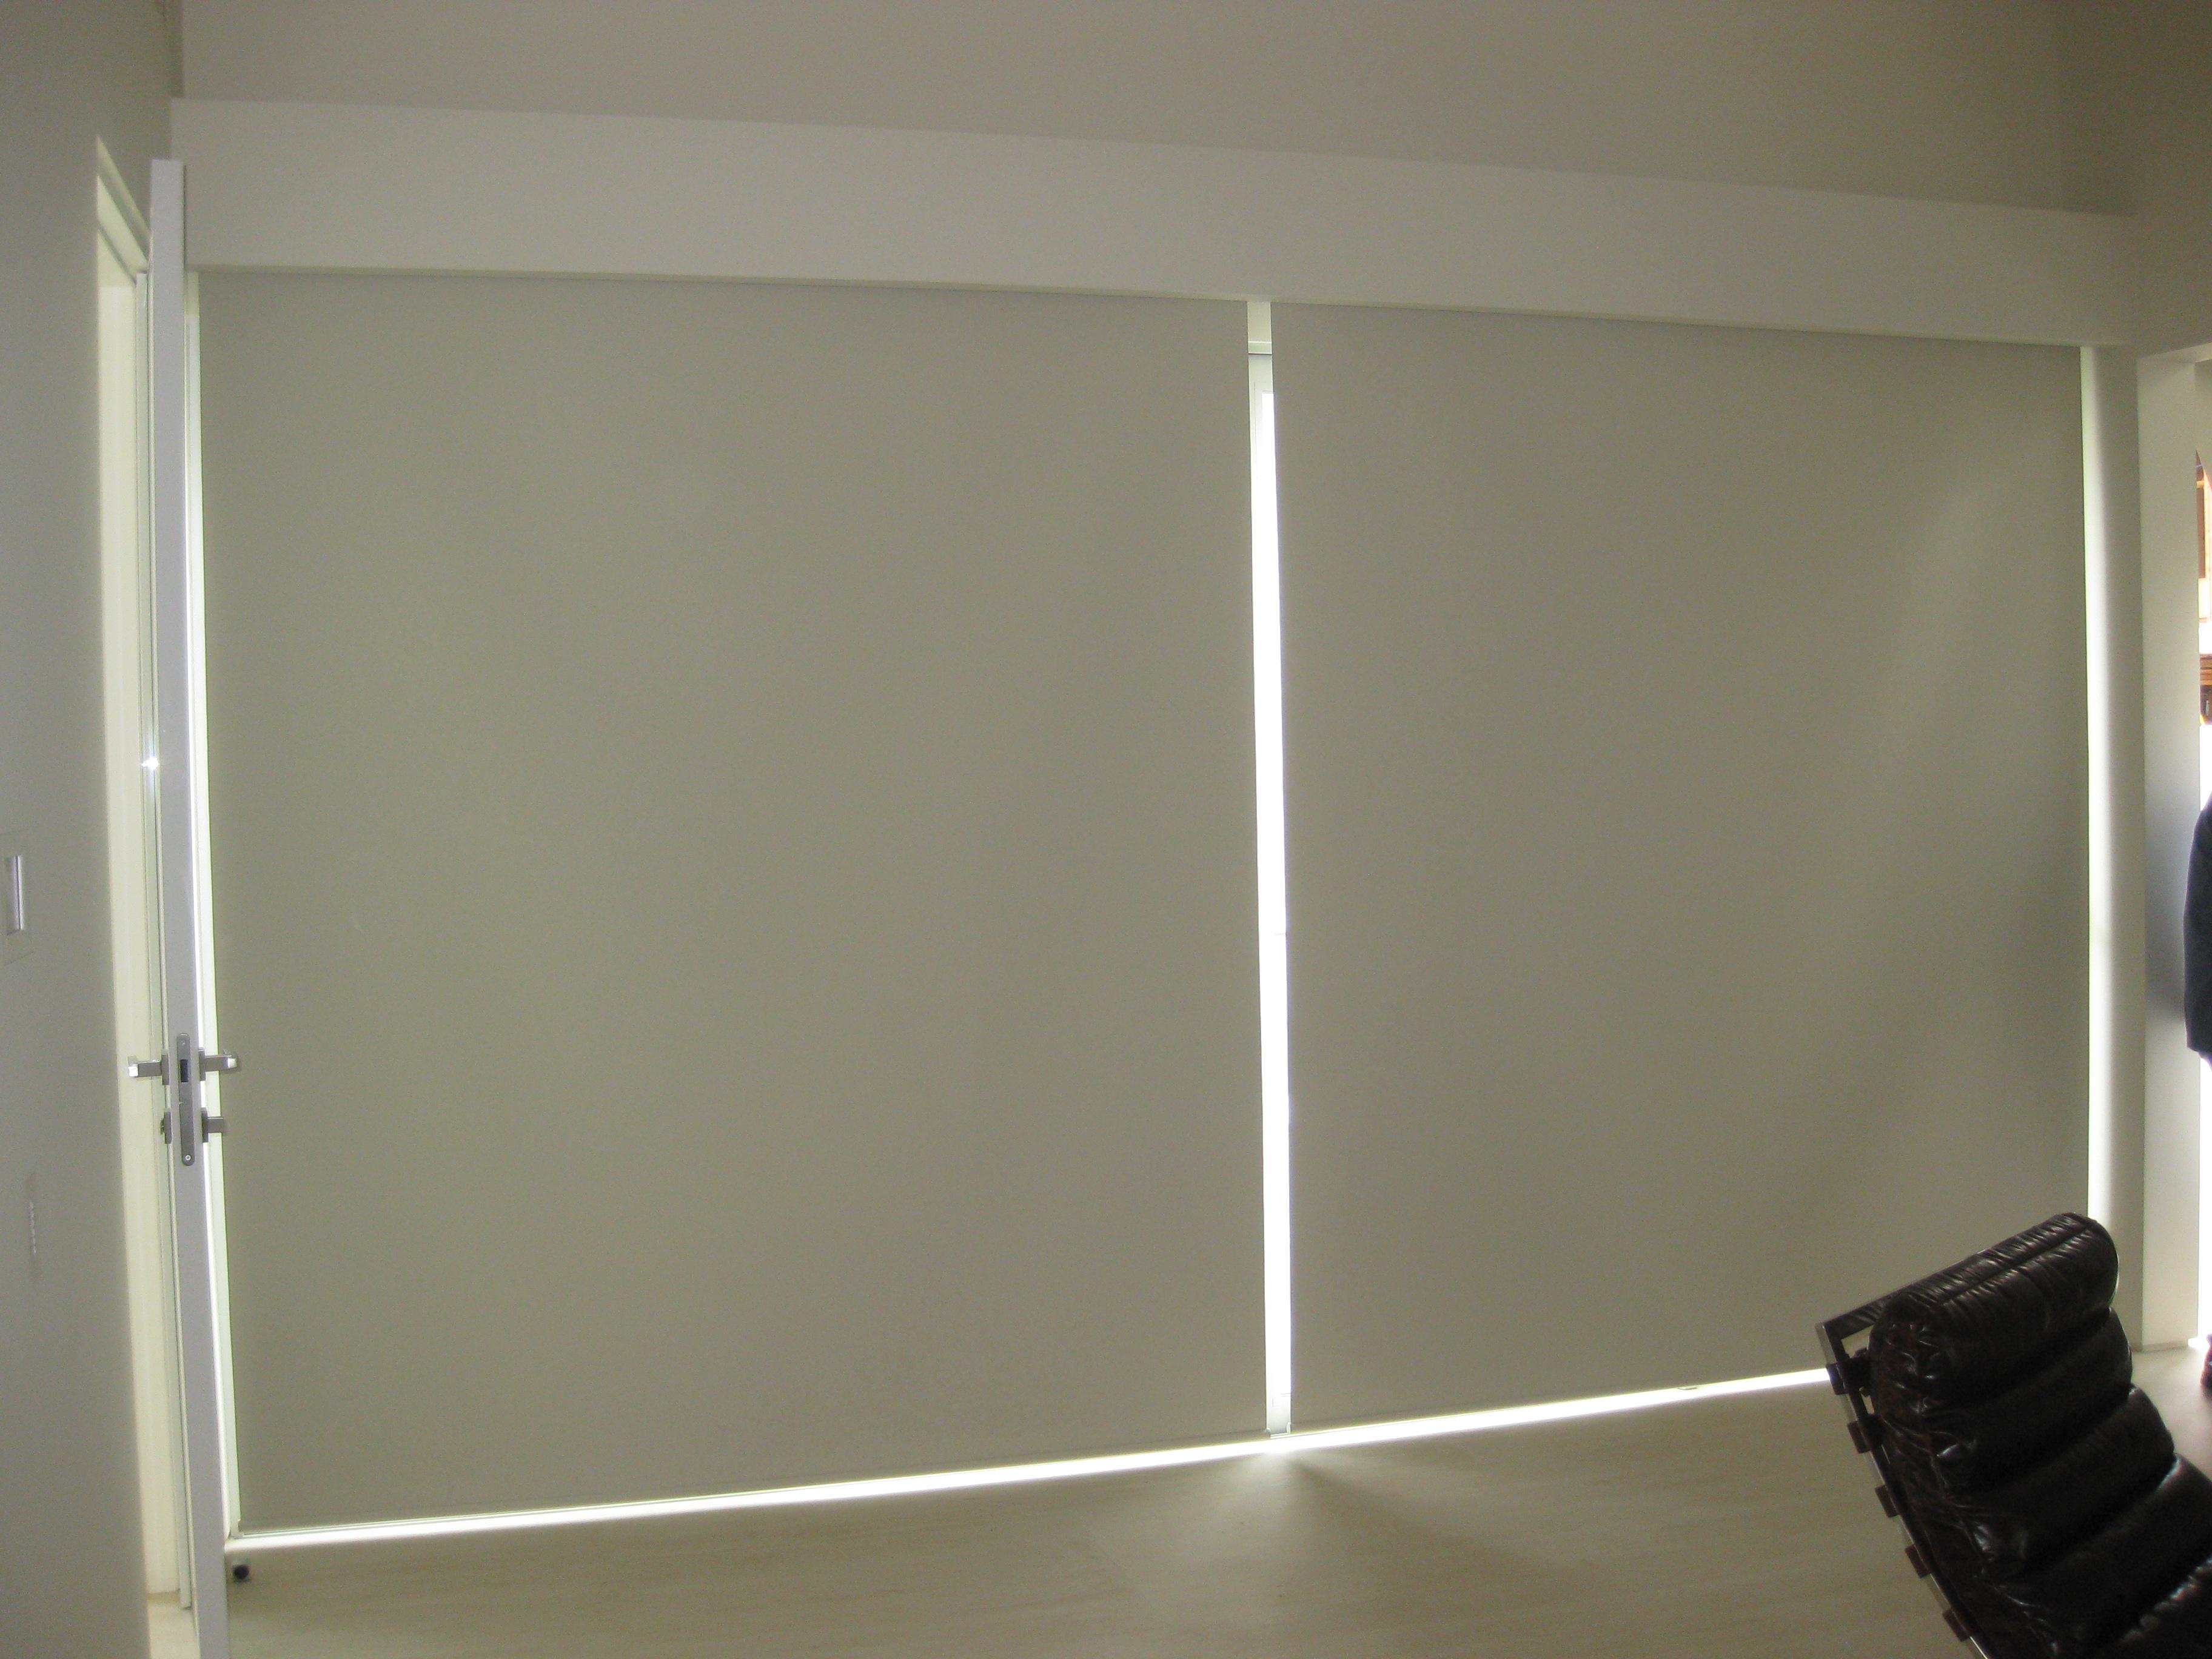 Blackout Roller Shades For Sliding Glass Doors3648 X 2736